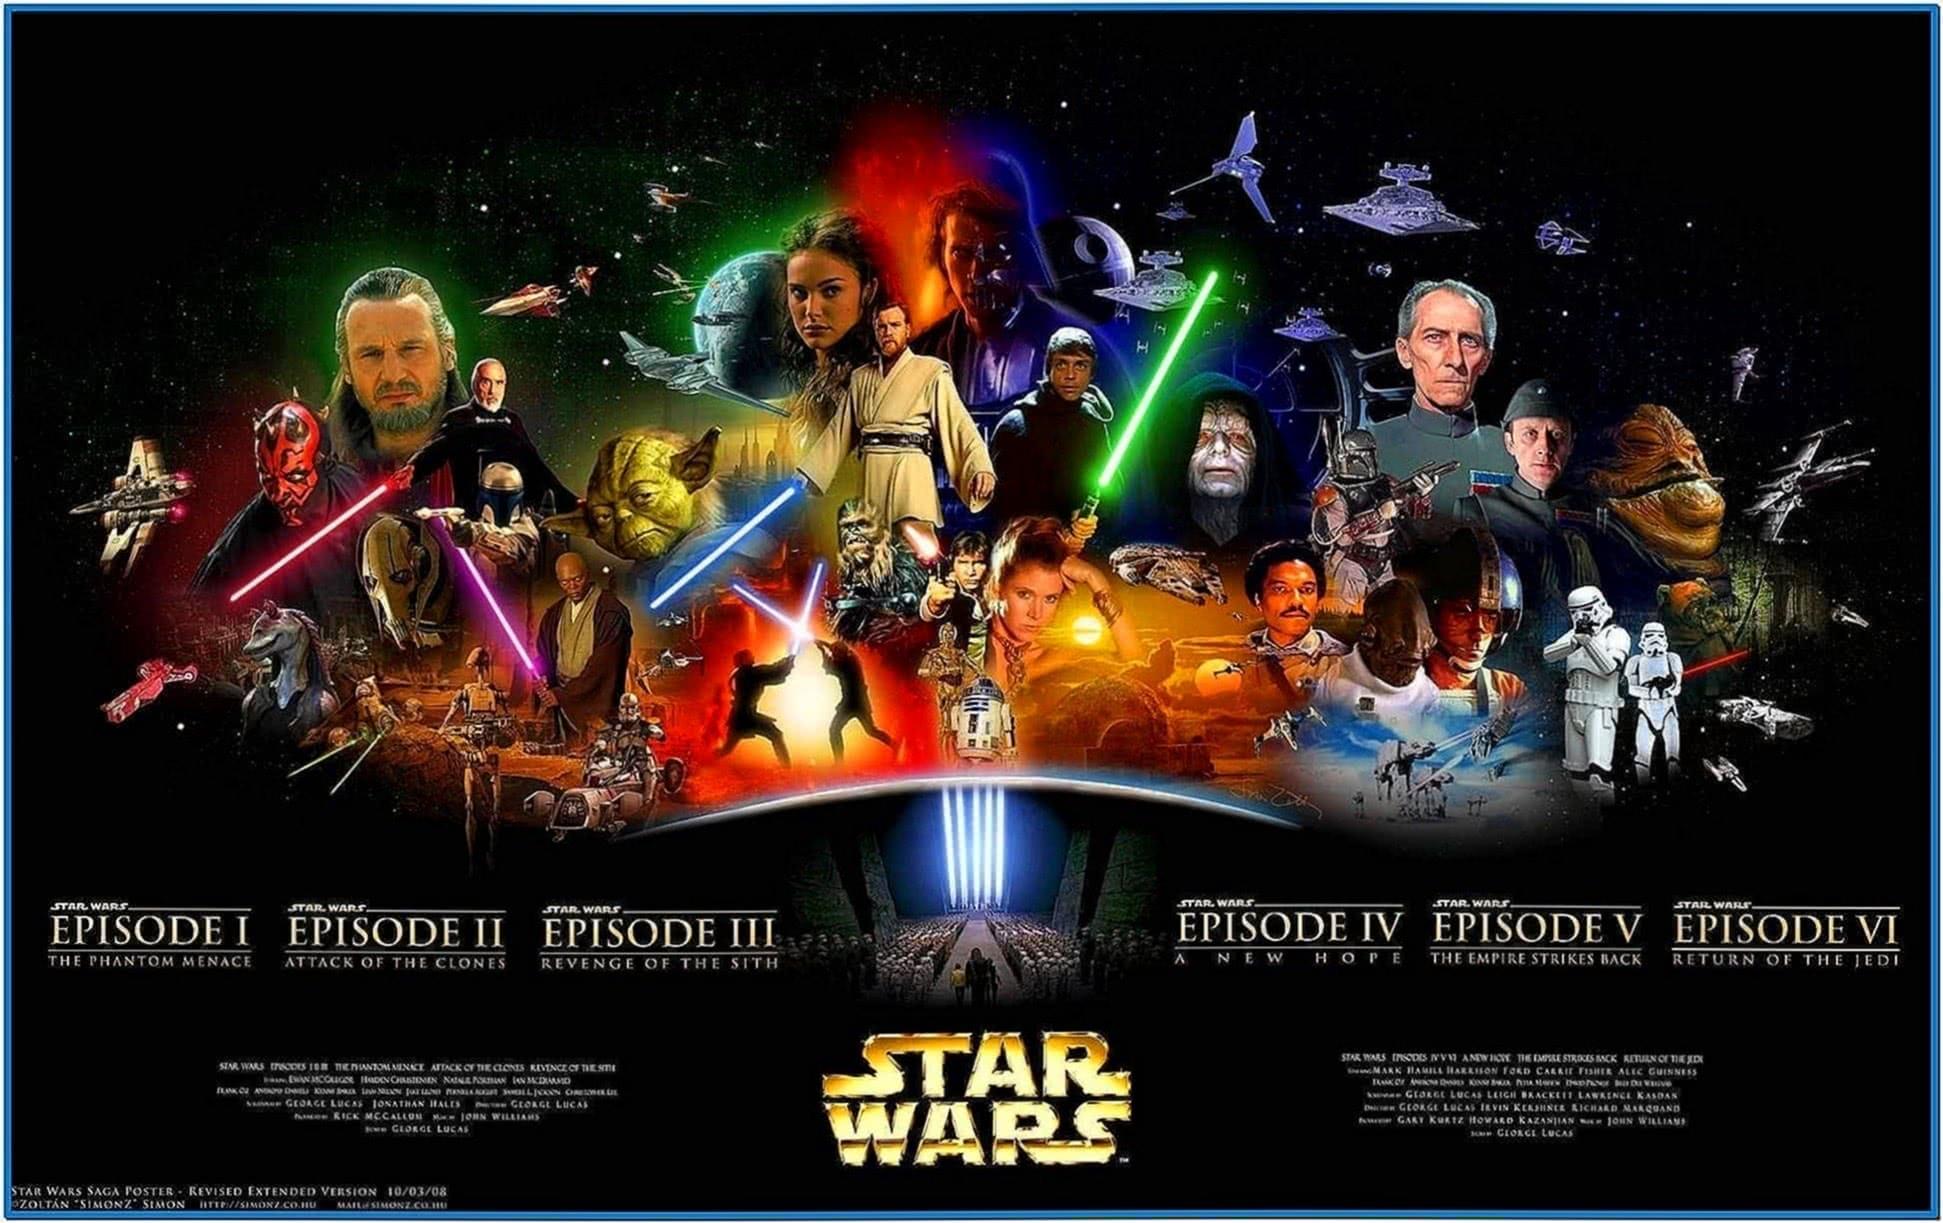 Star wars screensaver 3D Windows 7